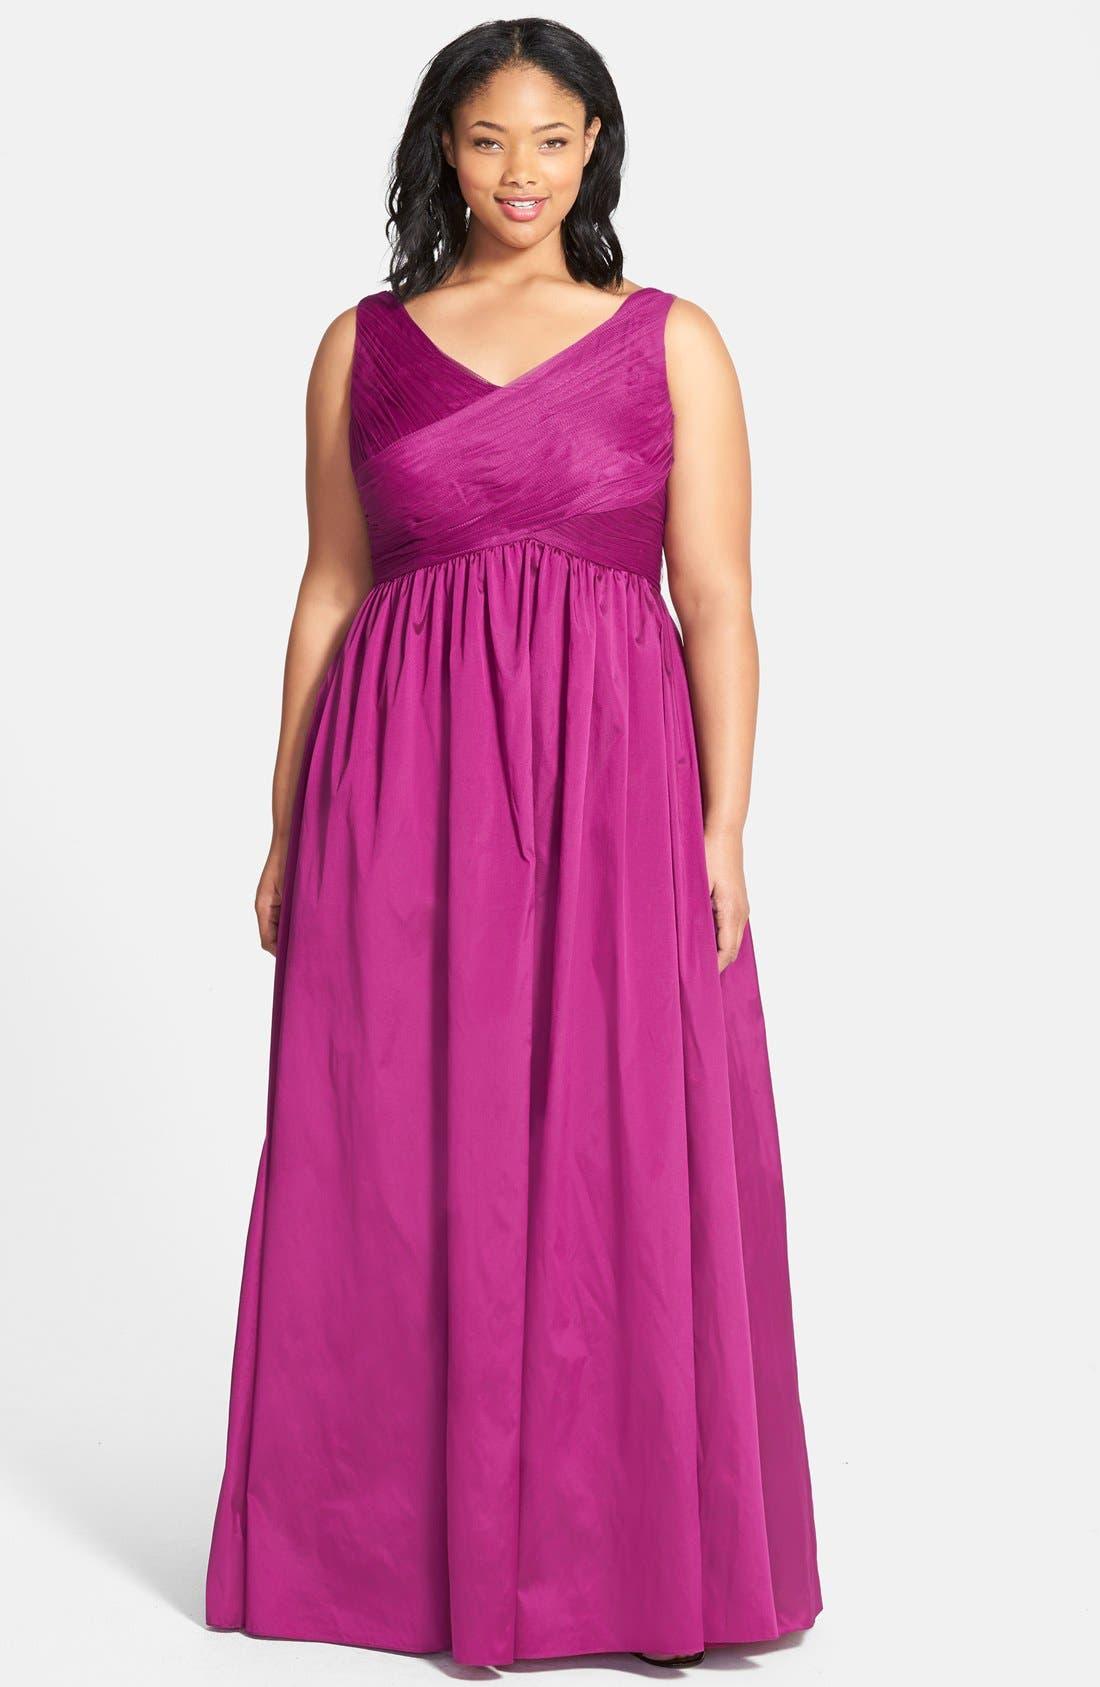 Main Image - Adrianna Papell Sleeveless Taffeta & Tulle Gown (Plus Size)